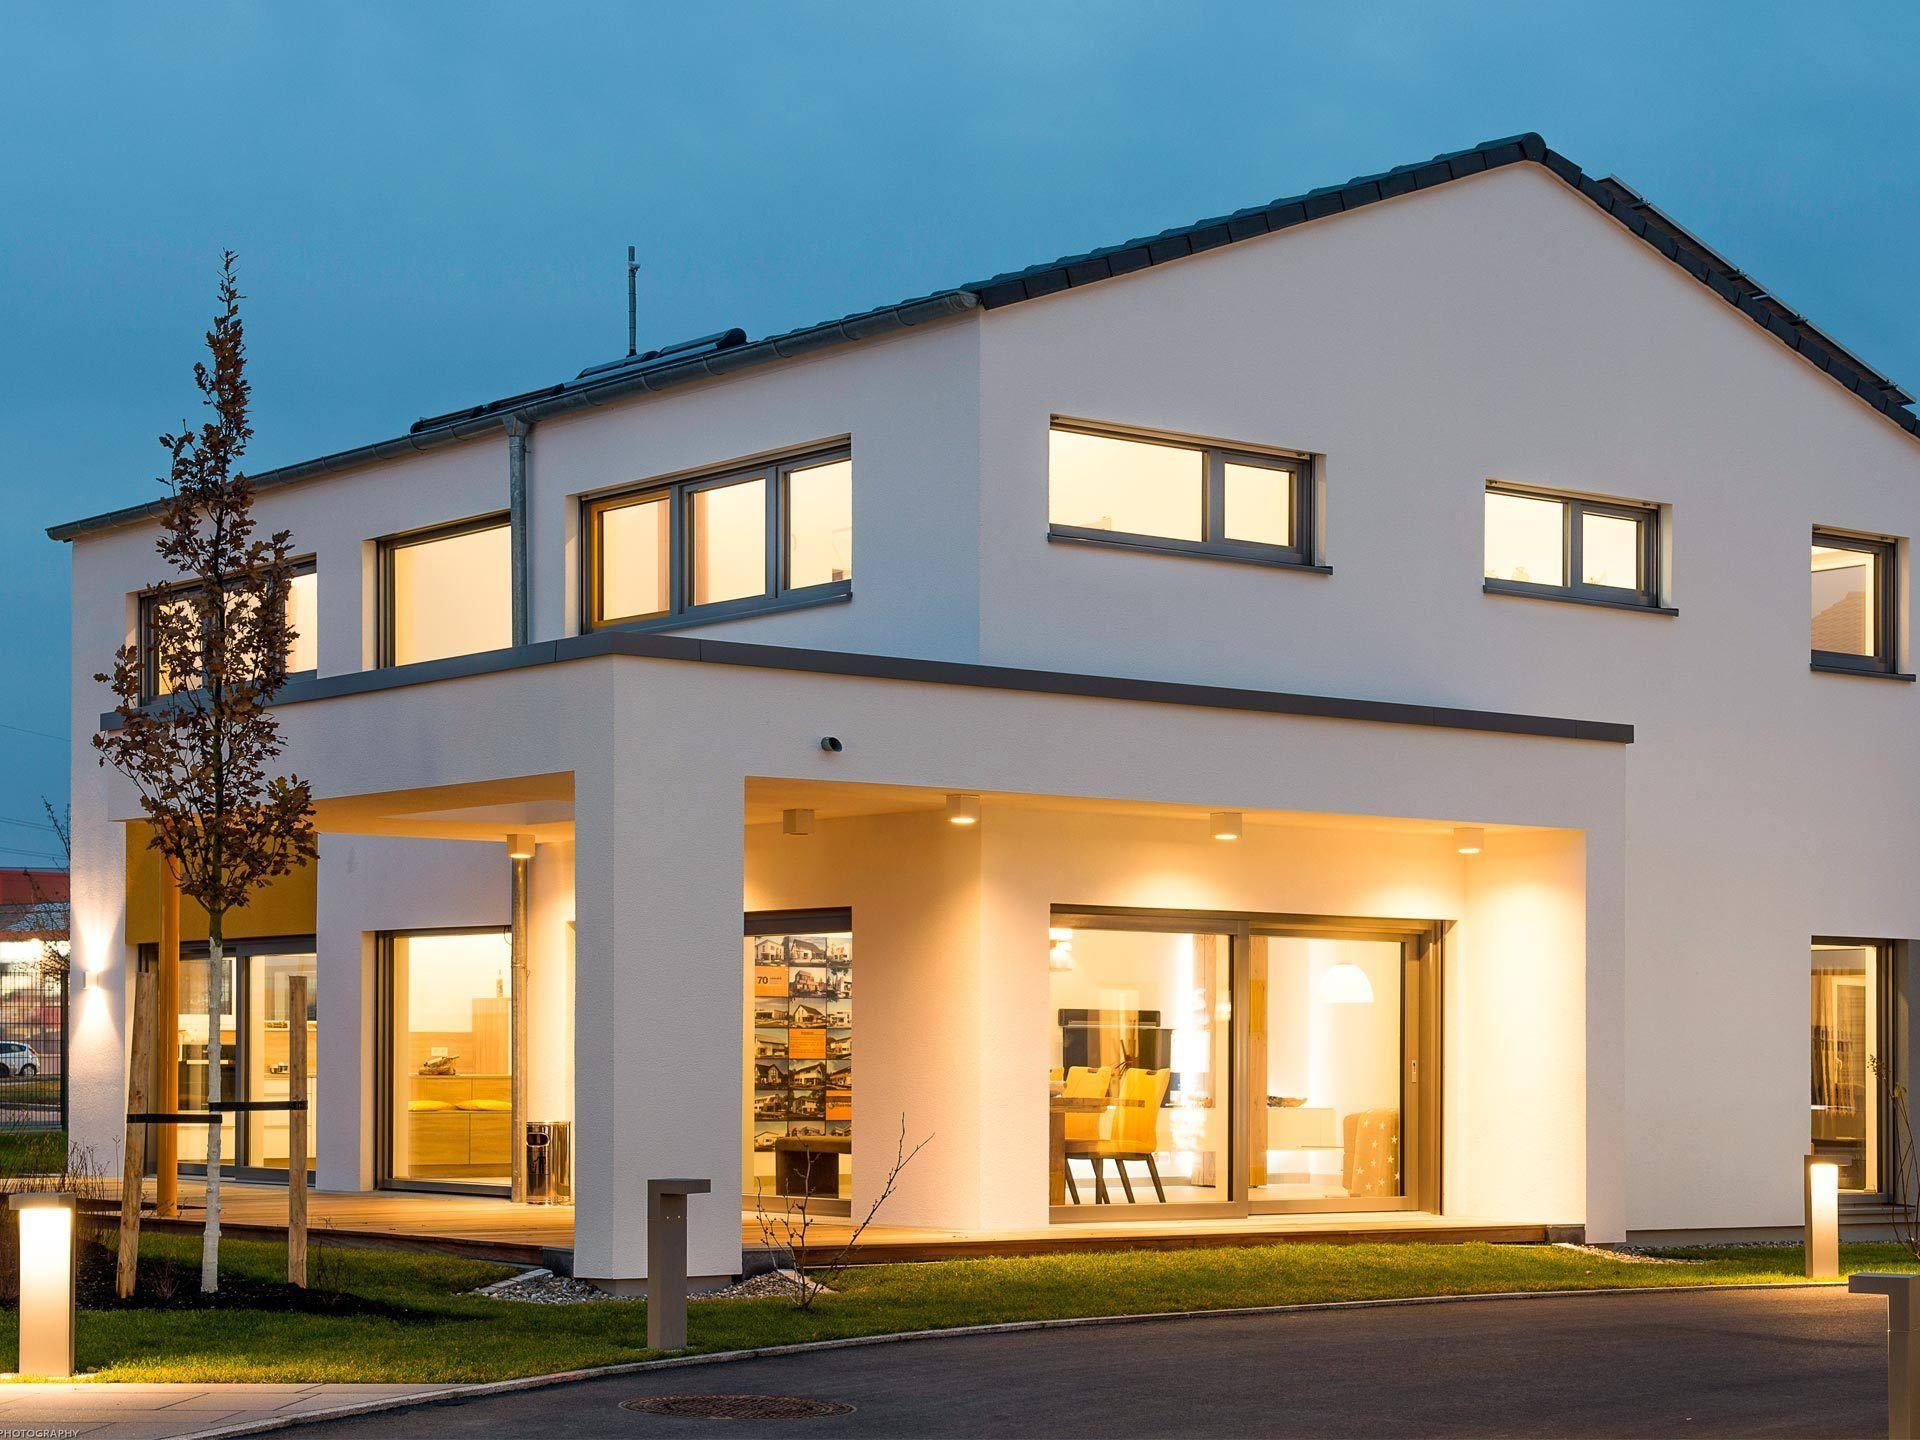 fertighaus mit satteldach musterhaus vitalis b denbender jetzt bei. Black Bedroom Furniture Sets. Home Design Ideas